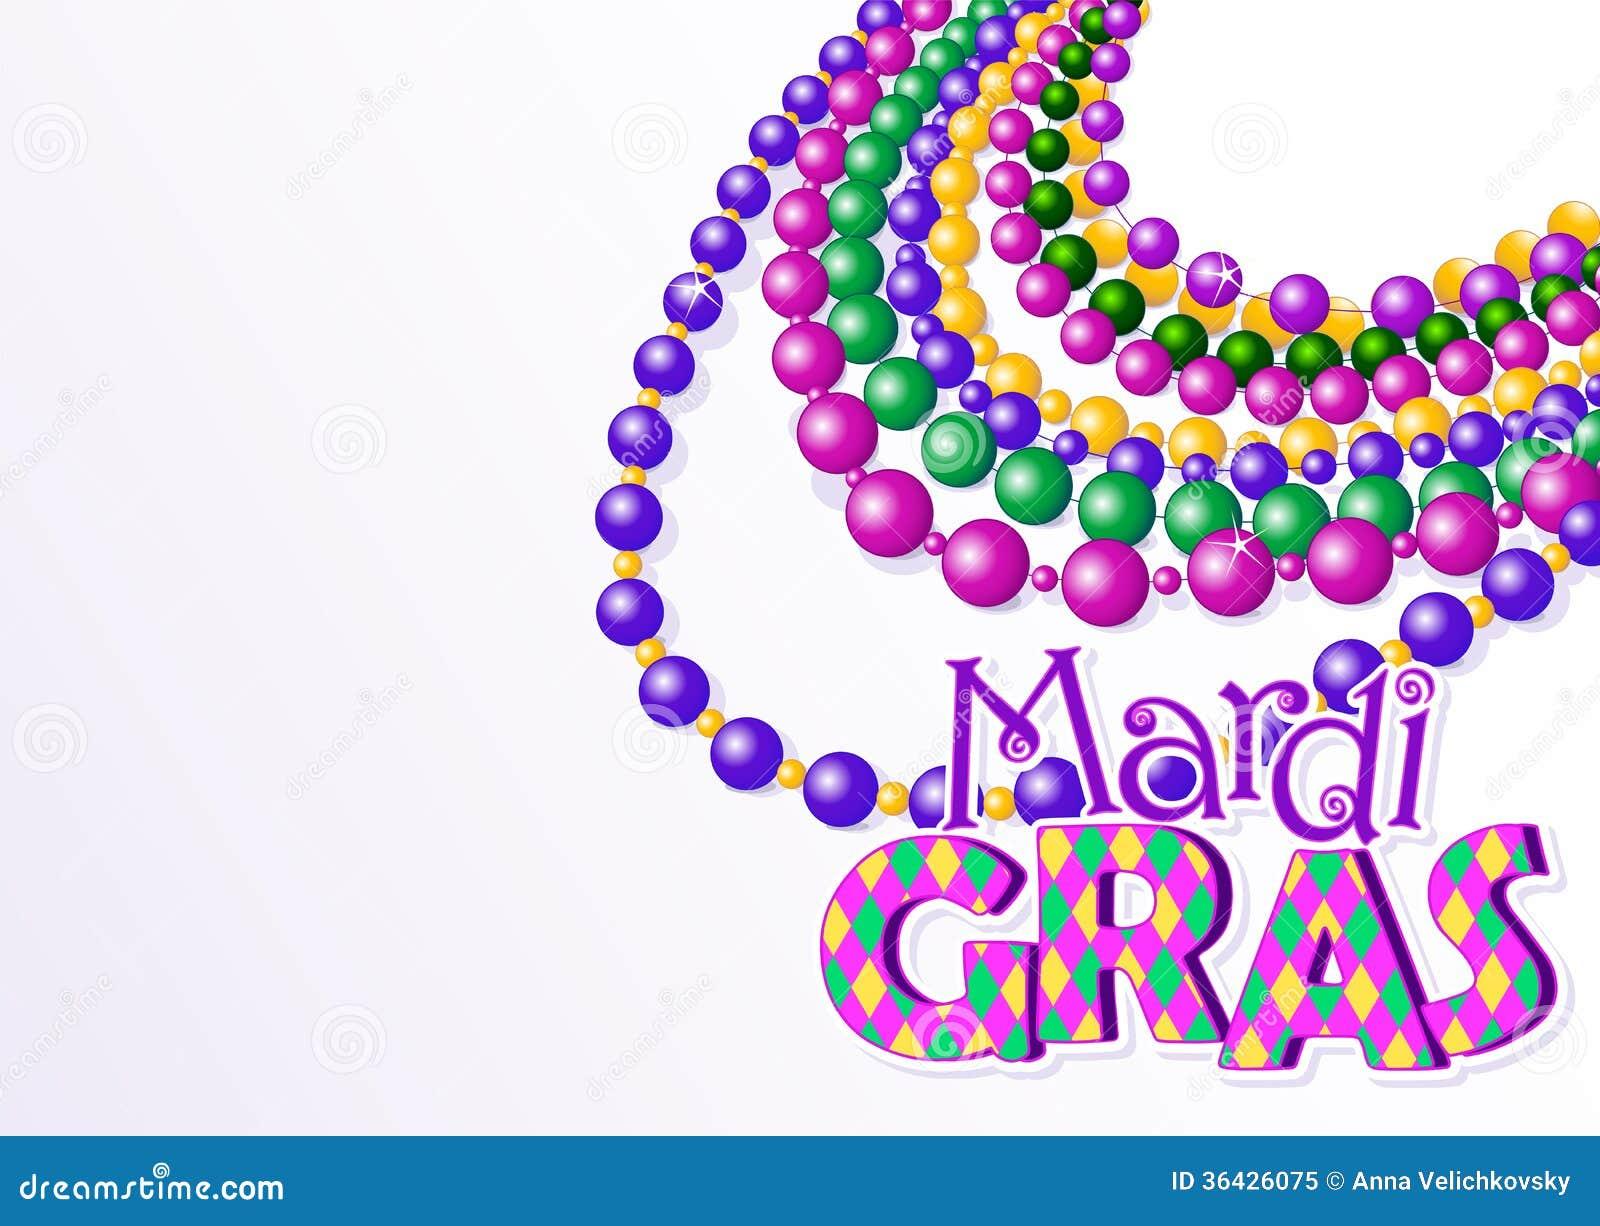 Mardi Gras Beads Background Stock Vector Illustration Of